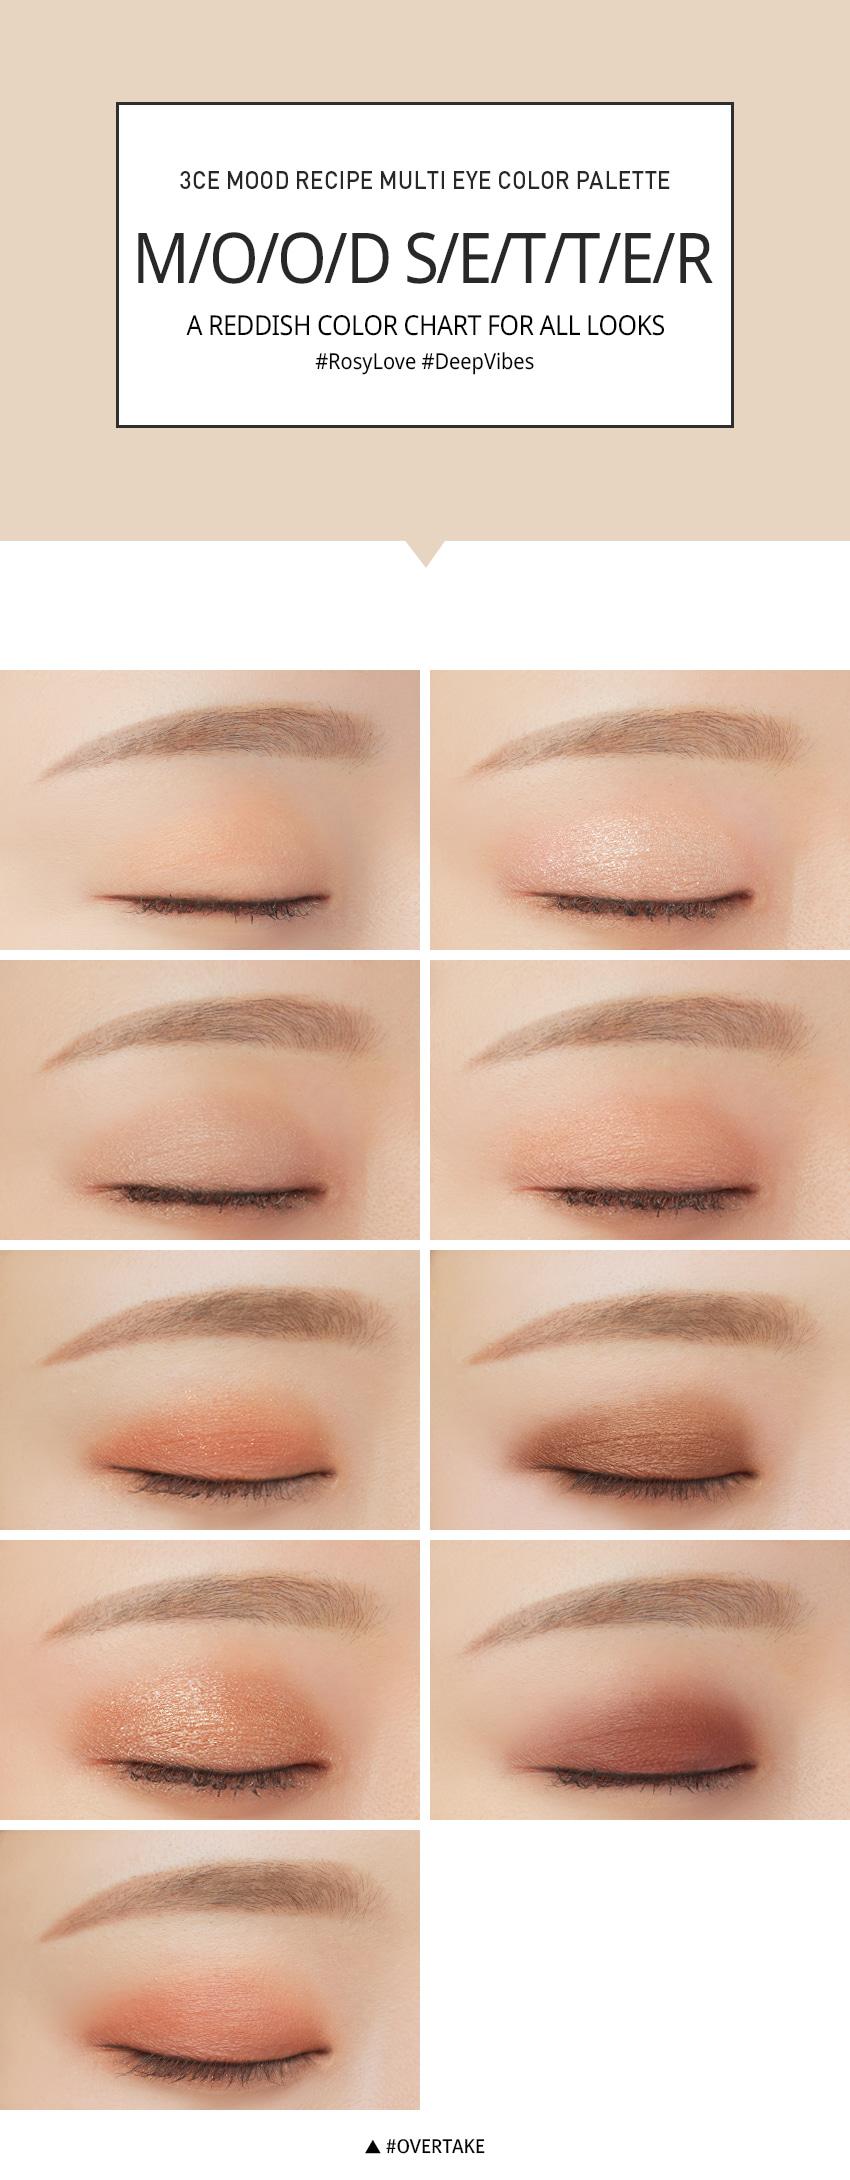 3ce mood recipe multi eye color palette overtake stylenanda 0047 geenschuldenfo Images